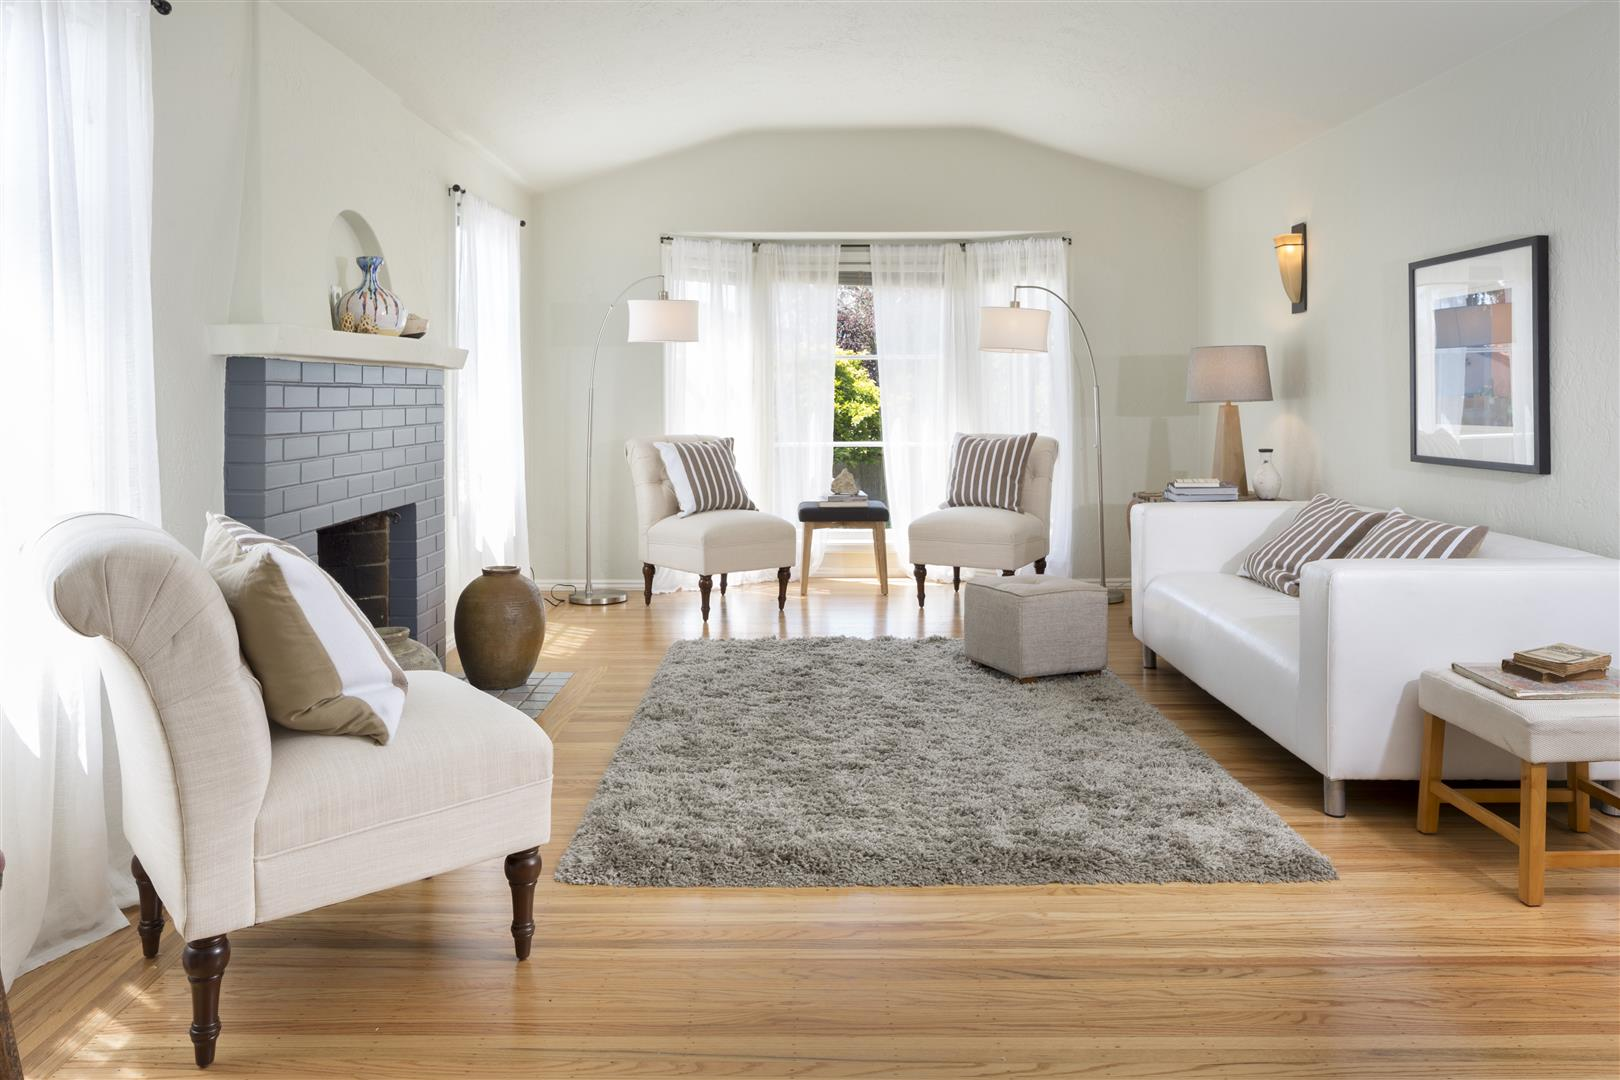 Lavagem de Tapetes e Carpetes